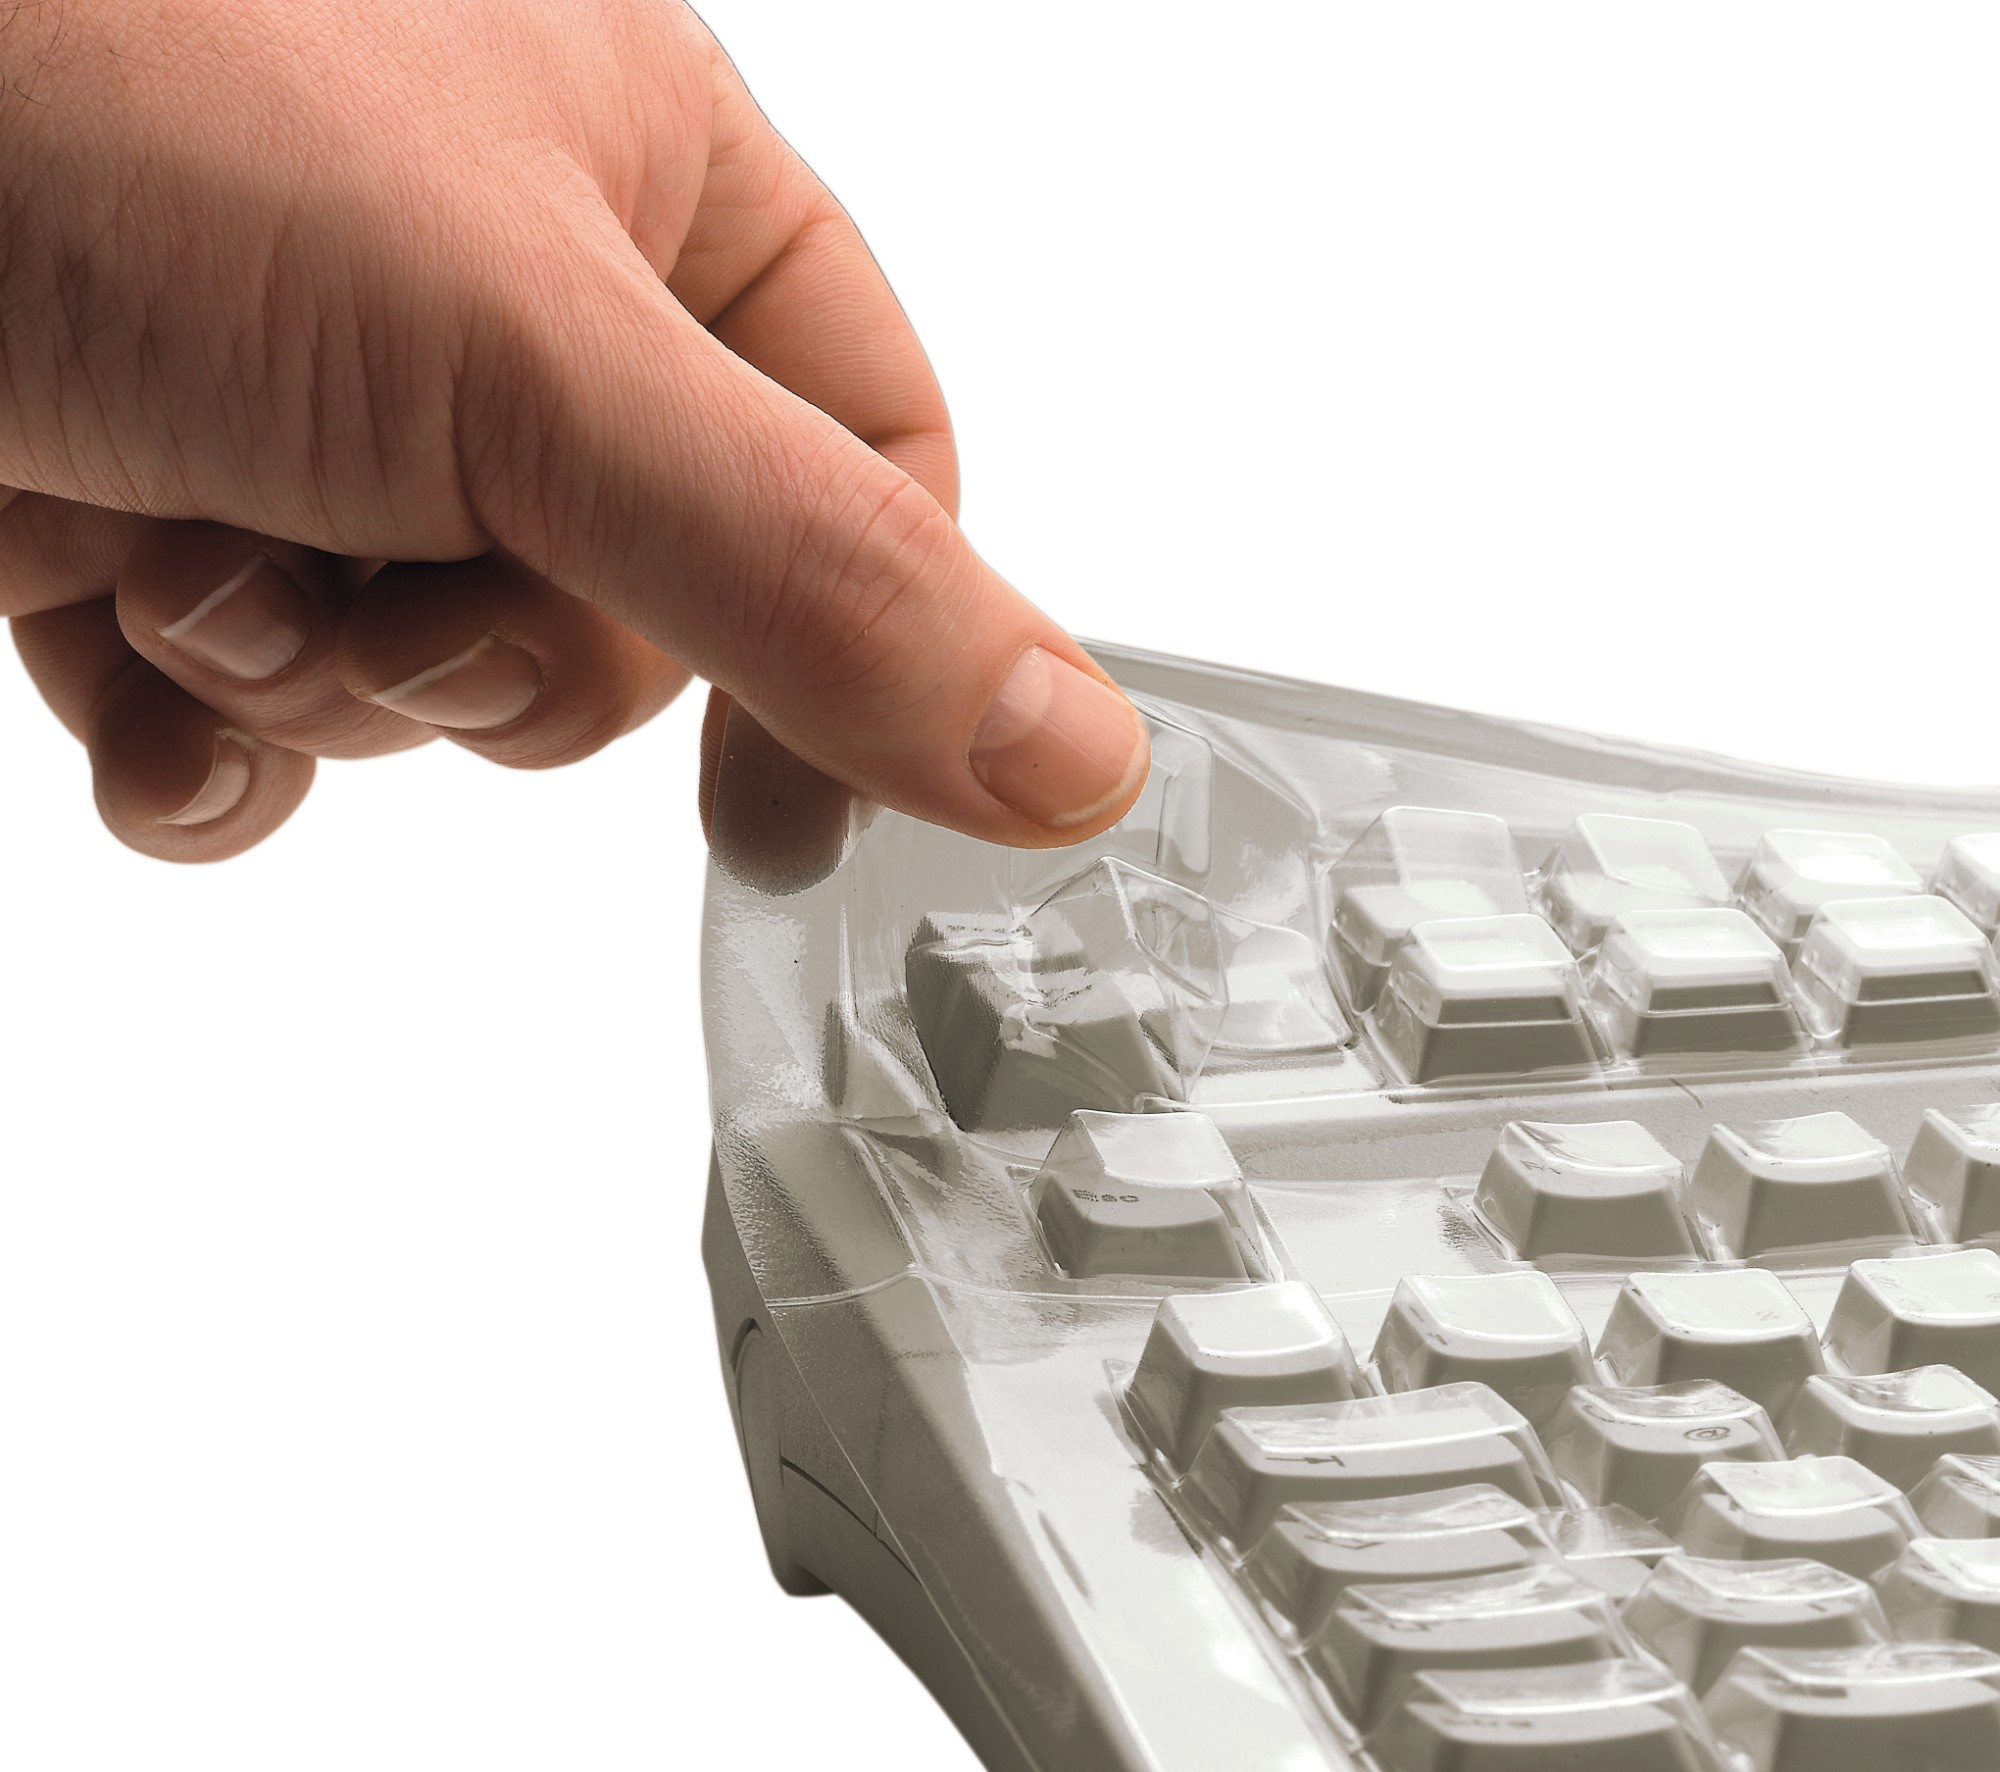 Keyboard G80-11900 / Keyskin (615-5141)